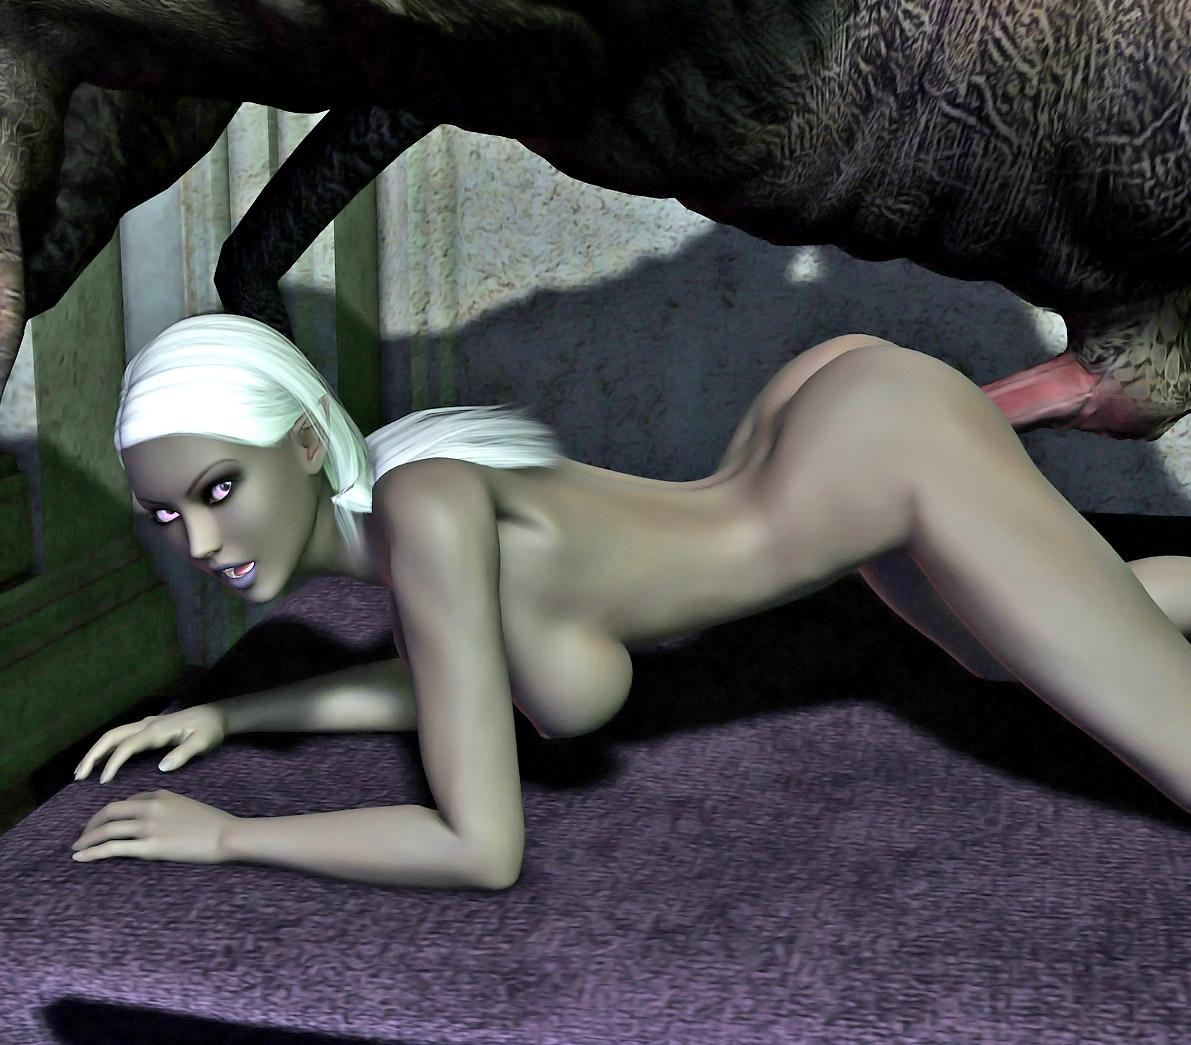 Anime elf girls suck cock images xxx pictures